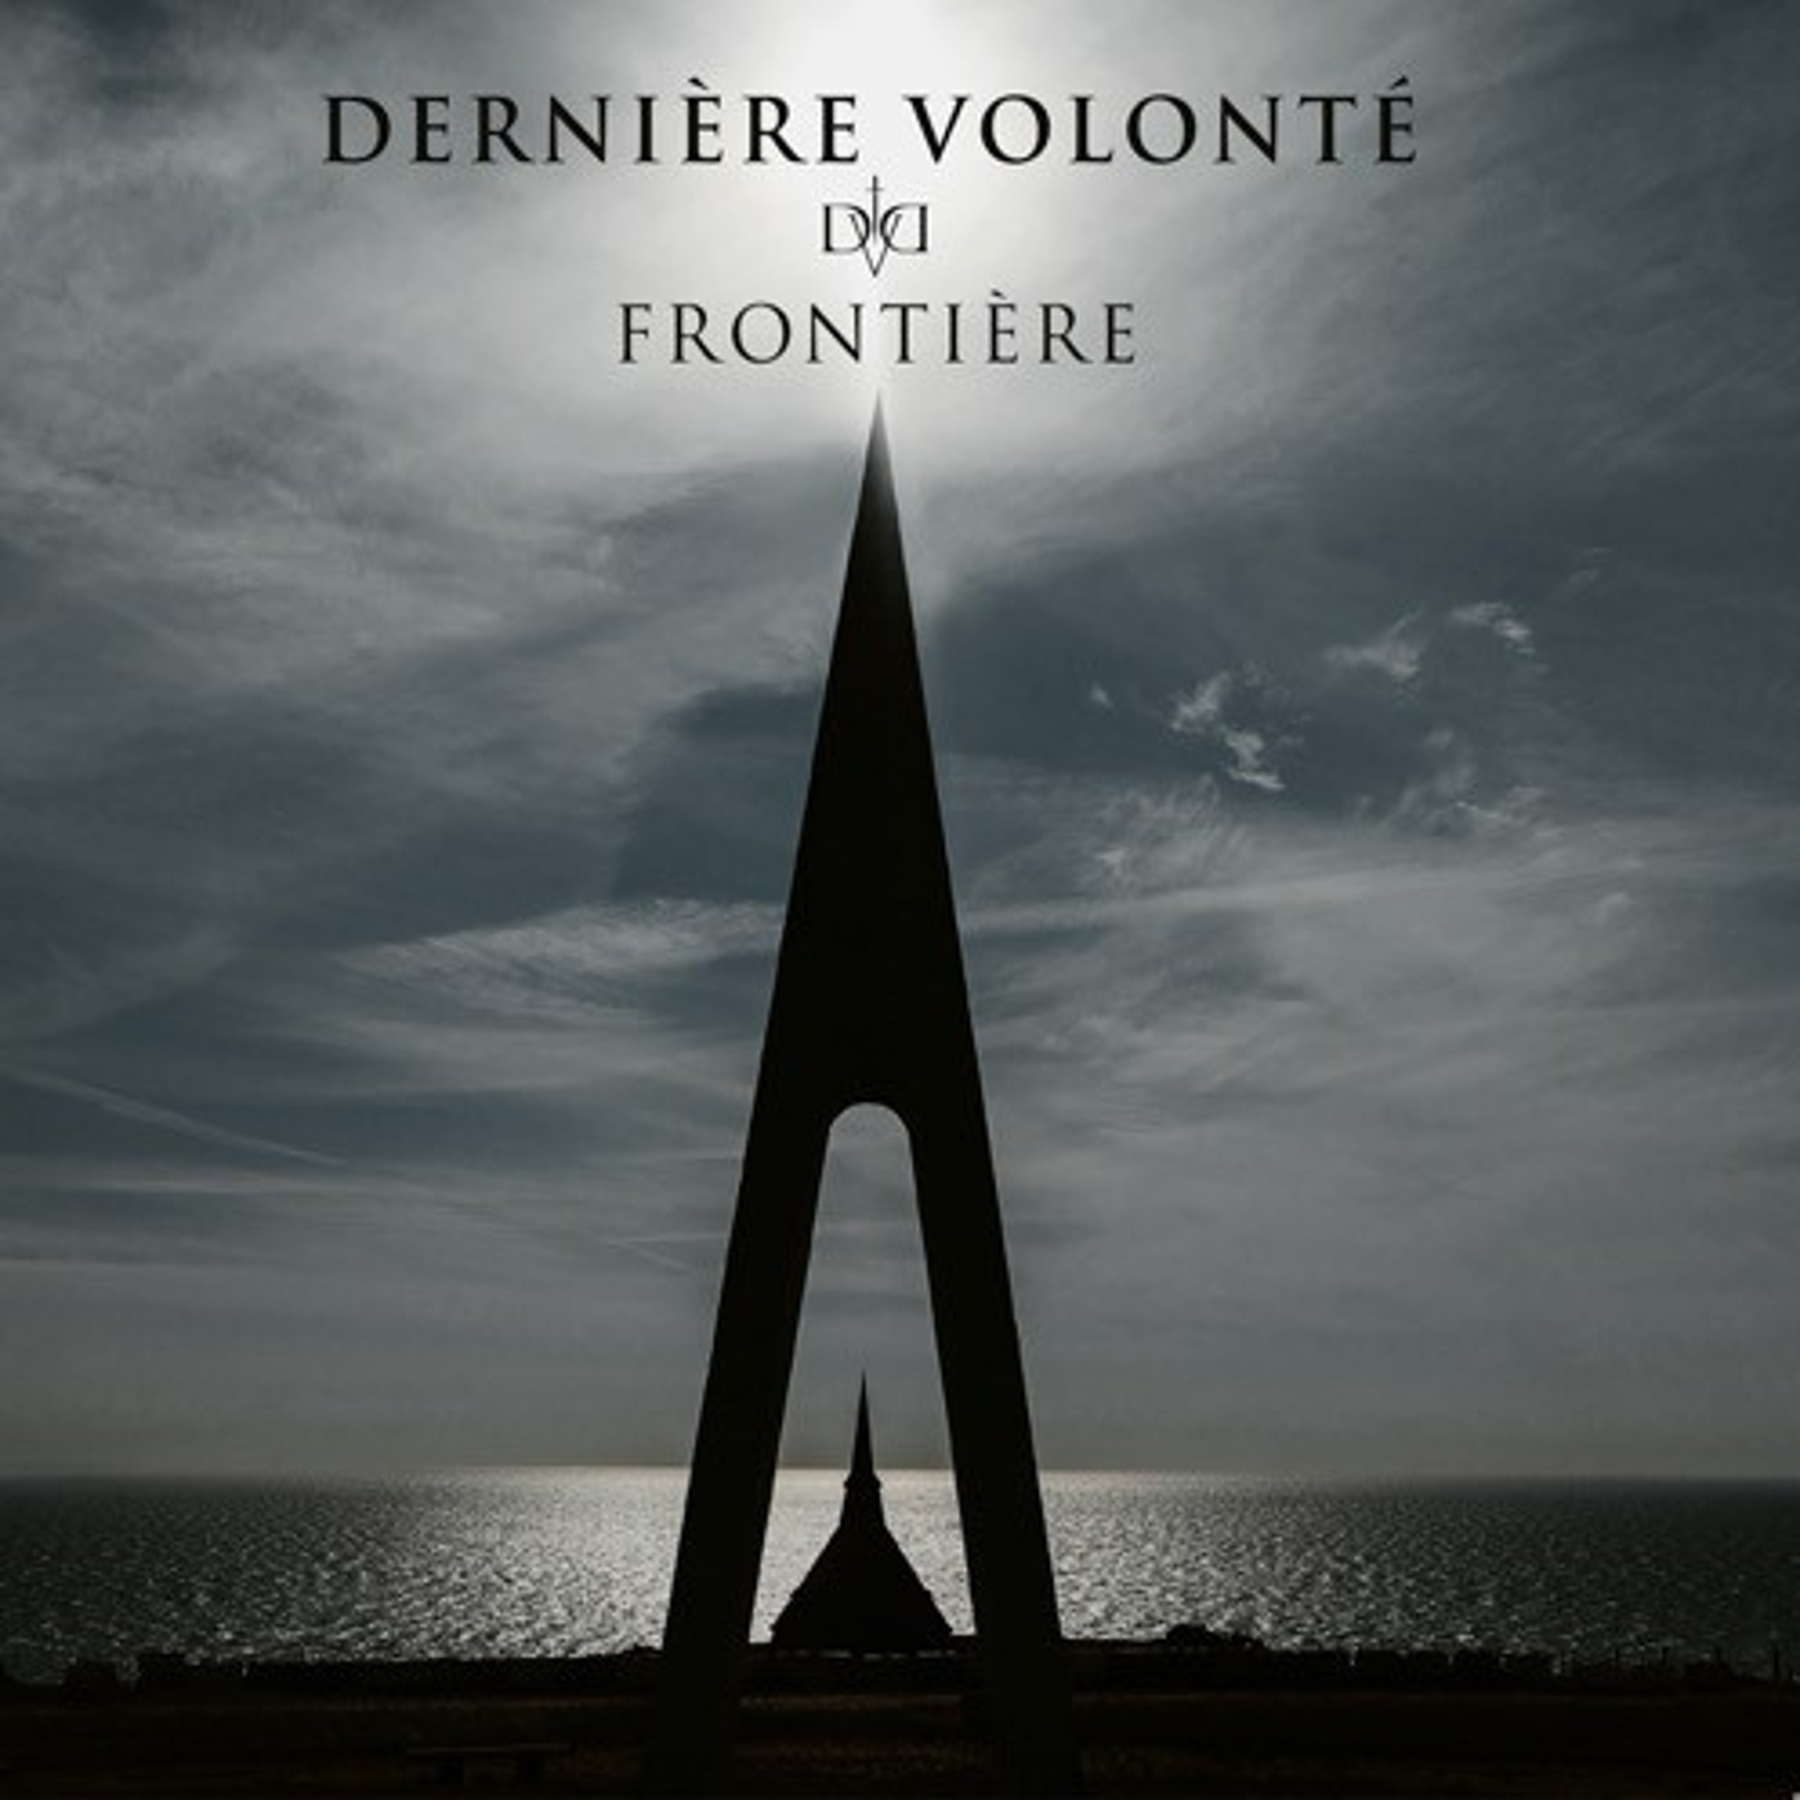 Derniere Volonte - Frontiere (Limited Black Vinyl) - 2LP